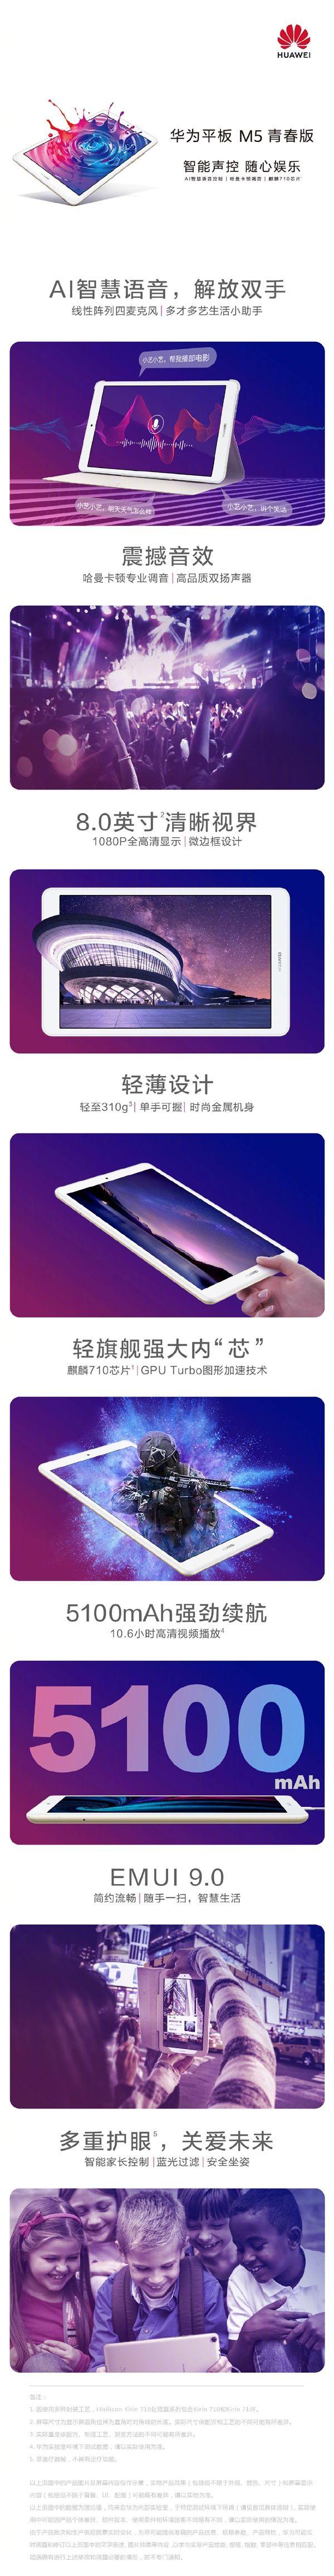 Представлены смартфоны Huawei Enjoy 9S и Enjoy 9e, а также планшет MediaPad M5 Lite – фото 8